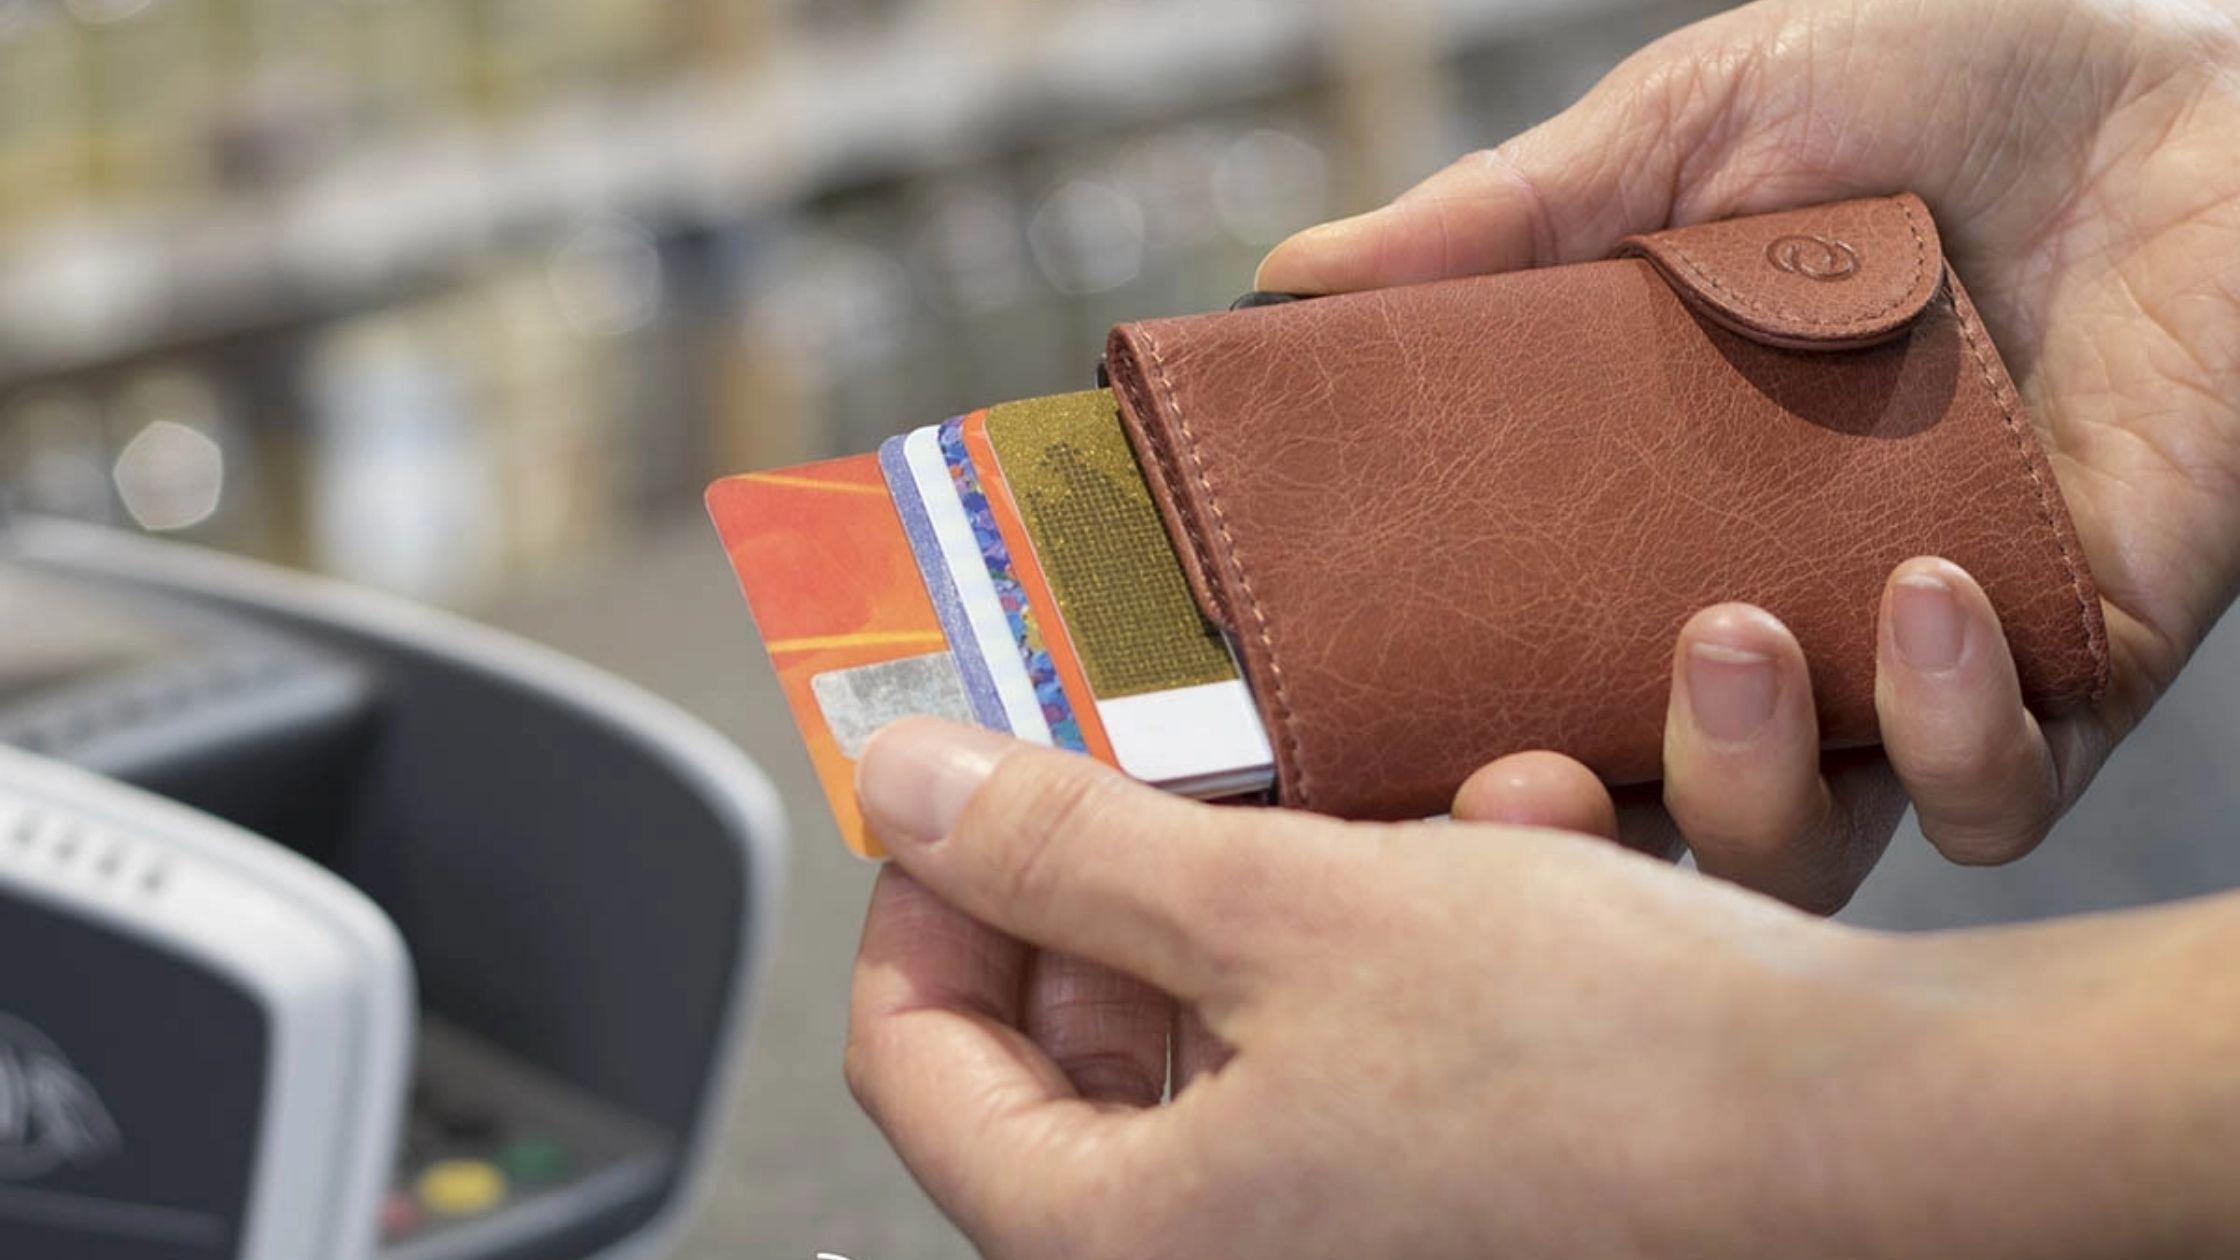 10 Intrebari arzatoare despre tehnologia RFID si portofel carduri RFID